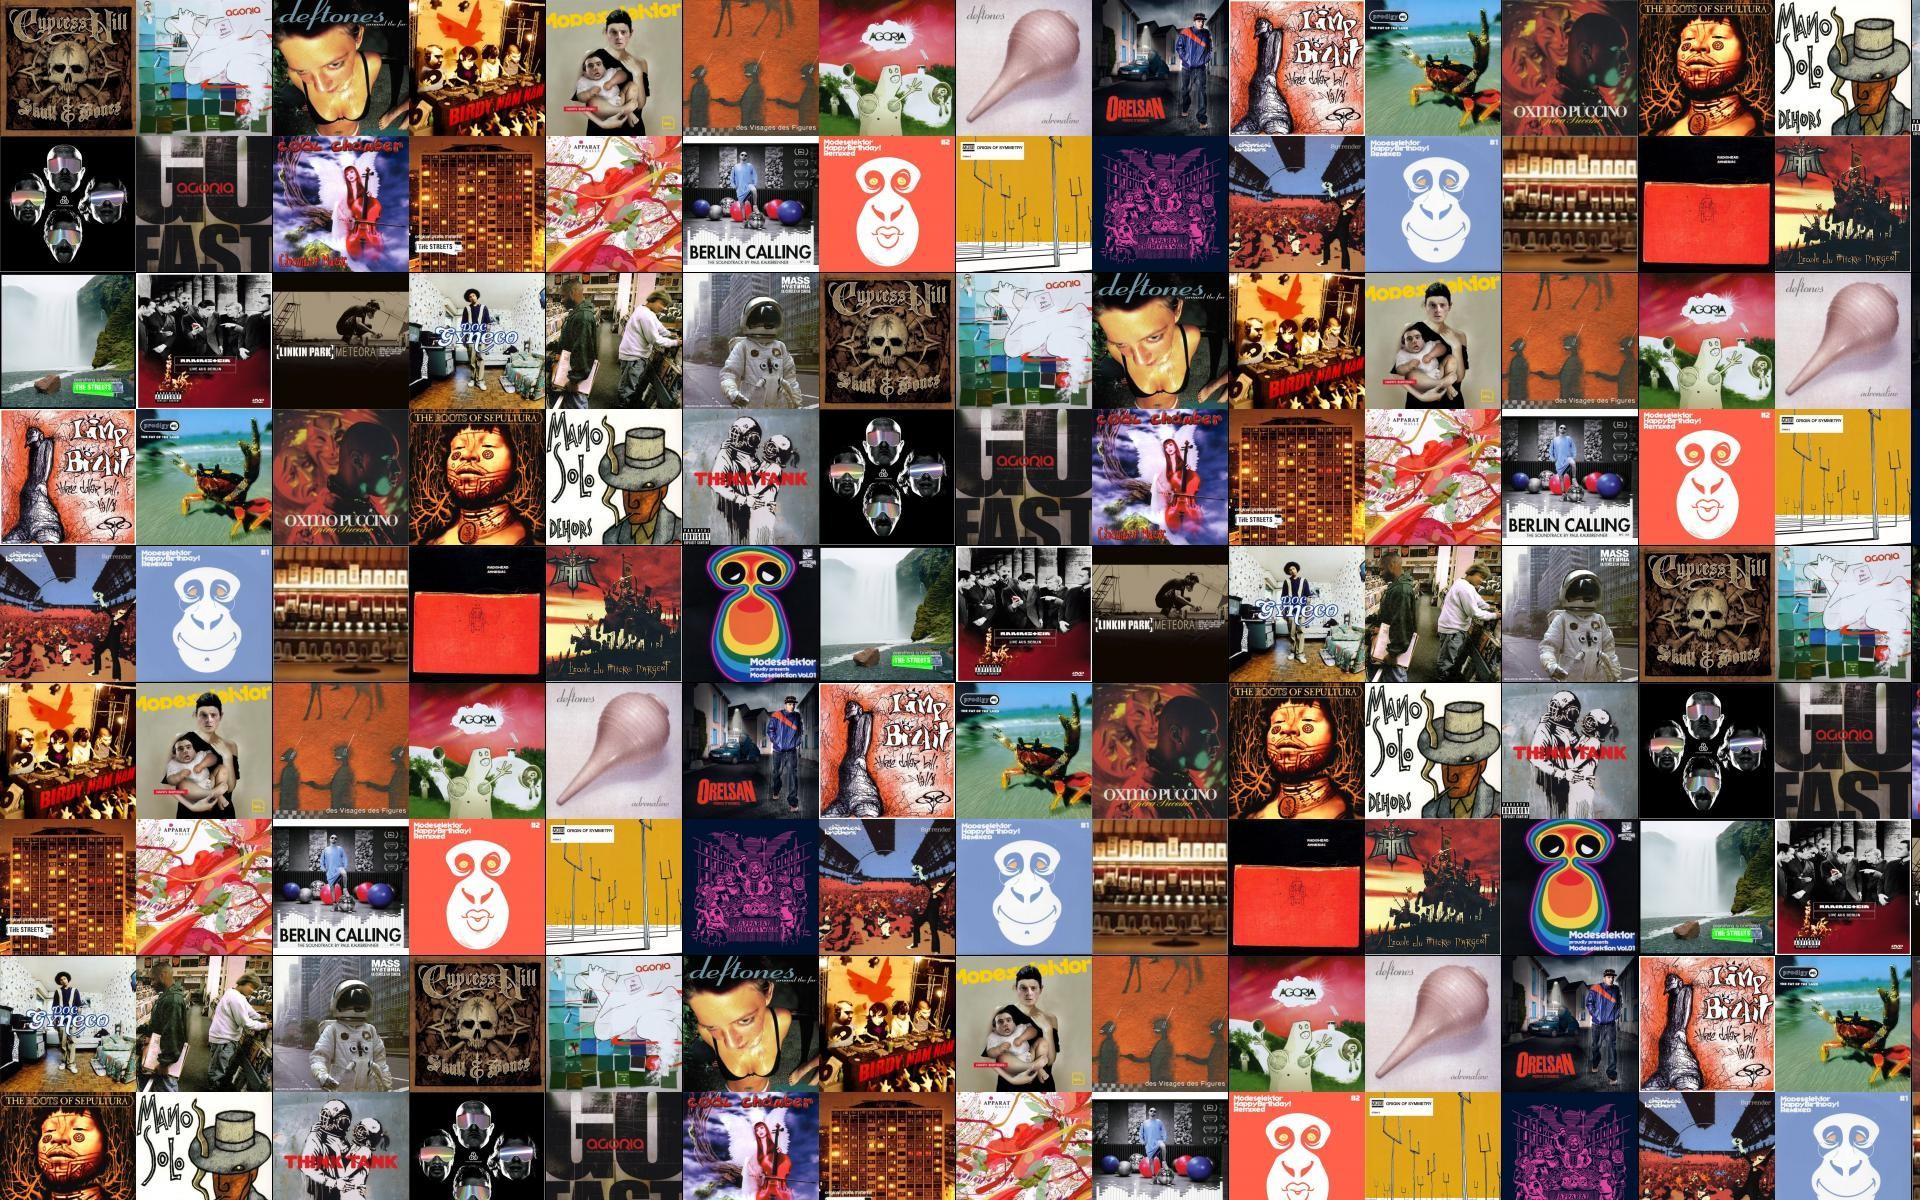 Album Cover Art Wallpaper (65+ images)